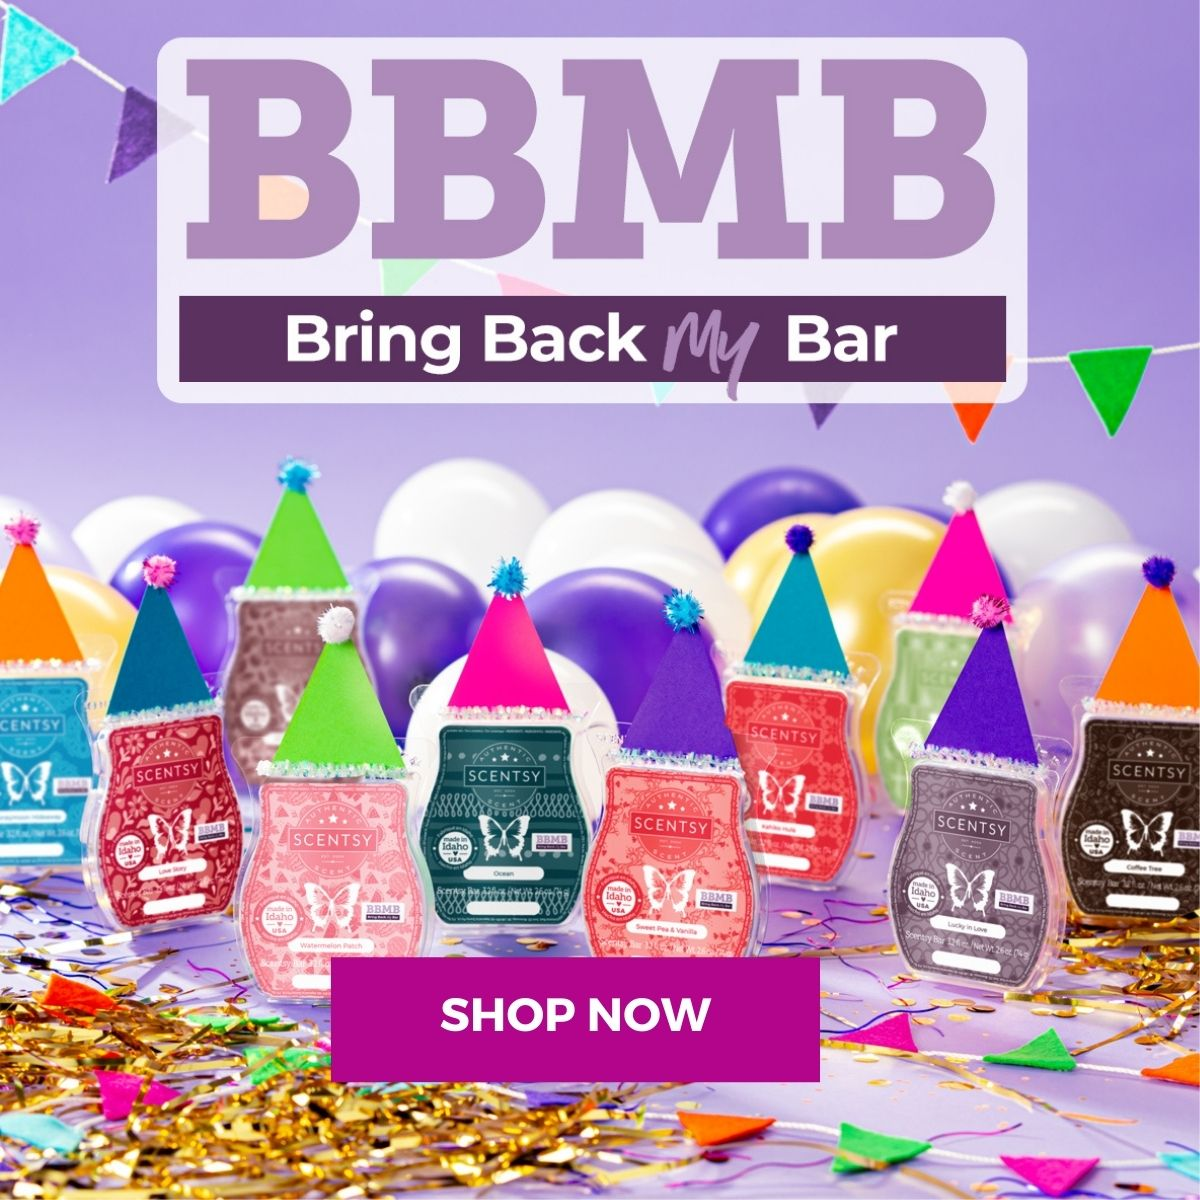 Scentsy Bring Back my Bar Summer 2021 | Shop Now